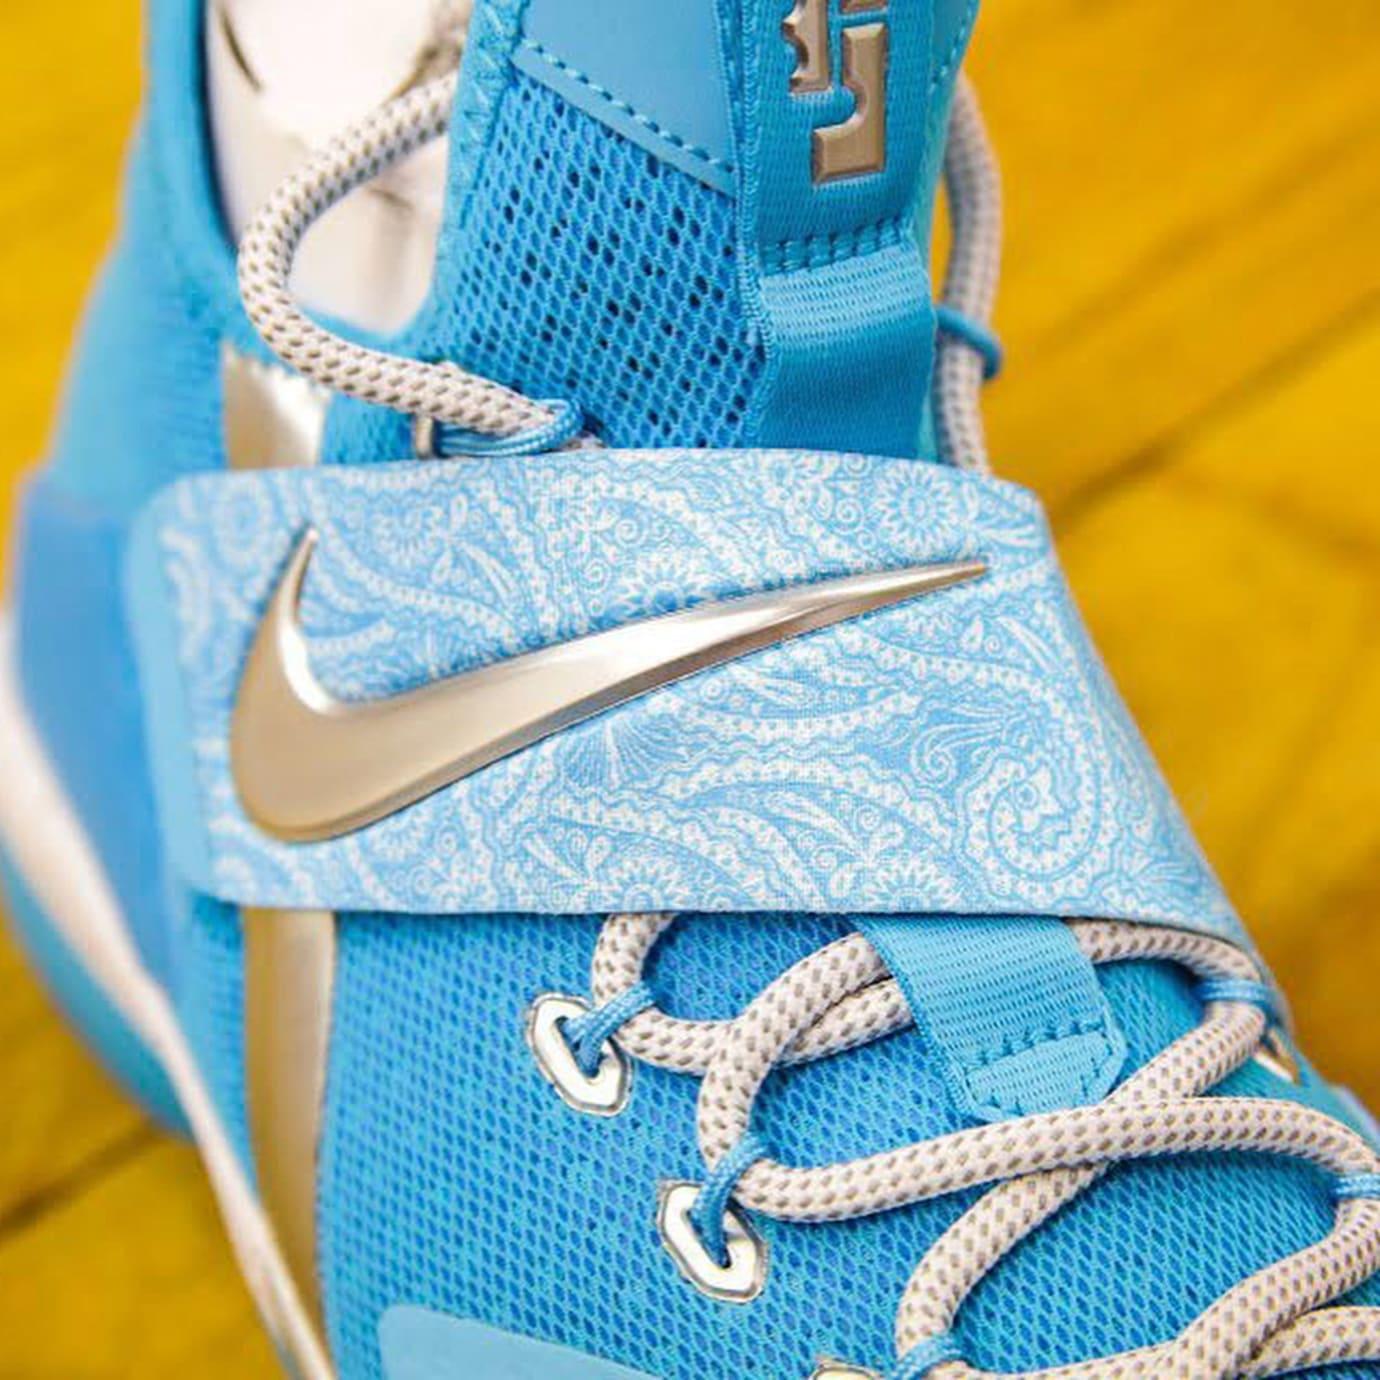 Nike LeBron 14 Blue White Release Date Strap AA3258-404